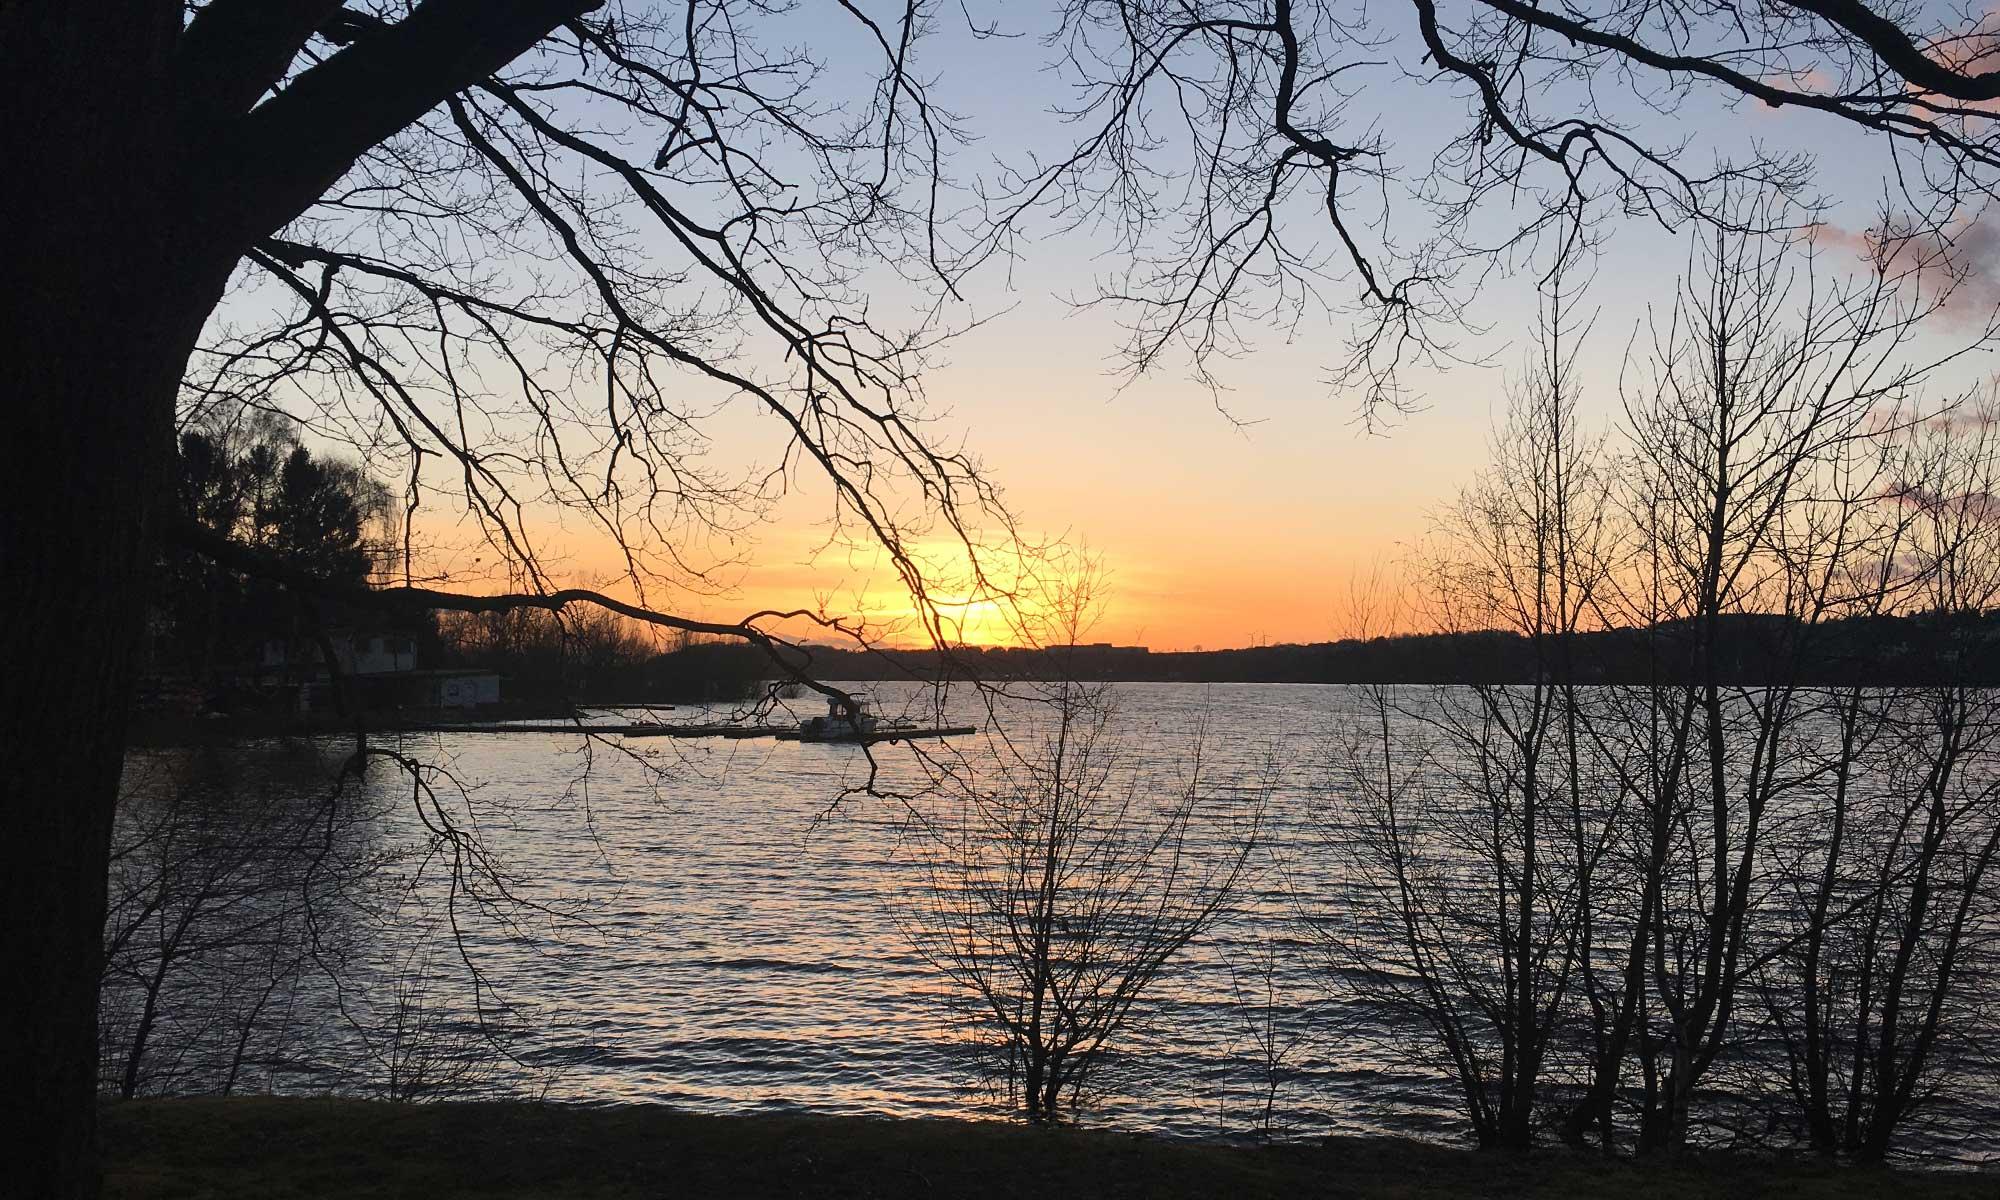 Möhne Talsperre Sonnenuntergang